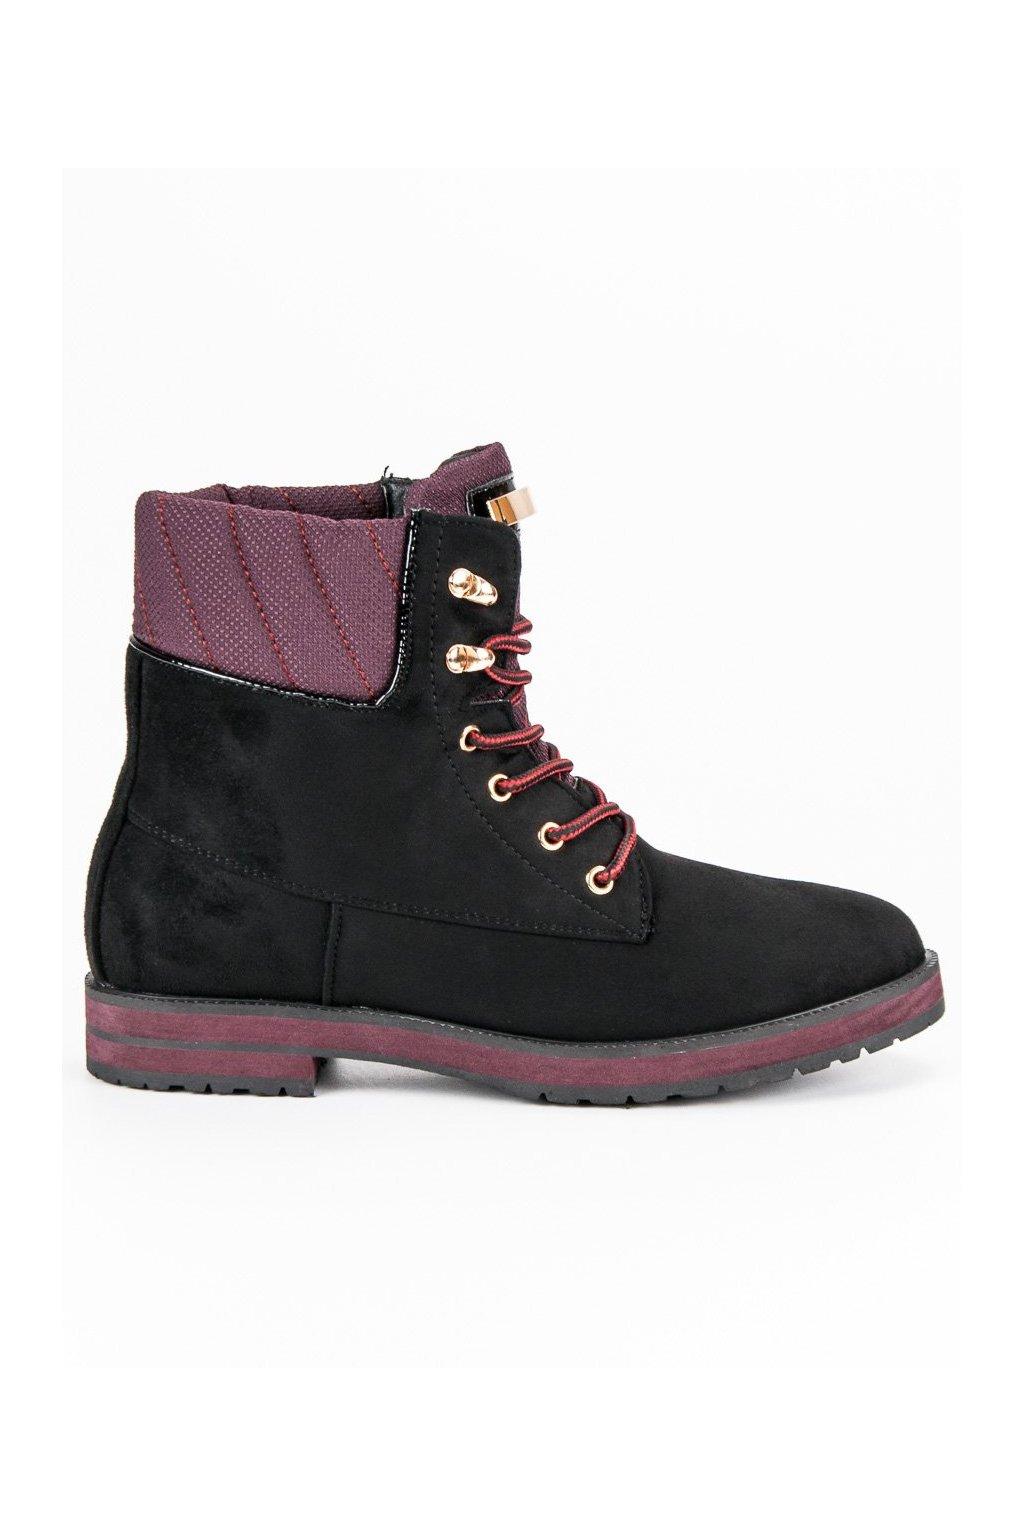 c0eb366432 1039334-1 cierne-topanky-semisove-workery-ideal-shoes.jpg 5bc90546